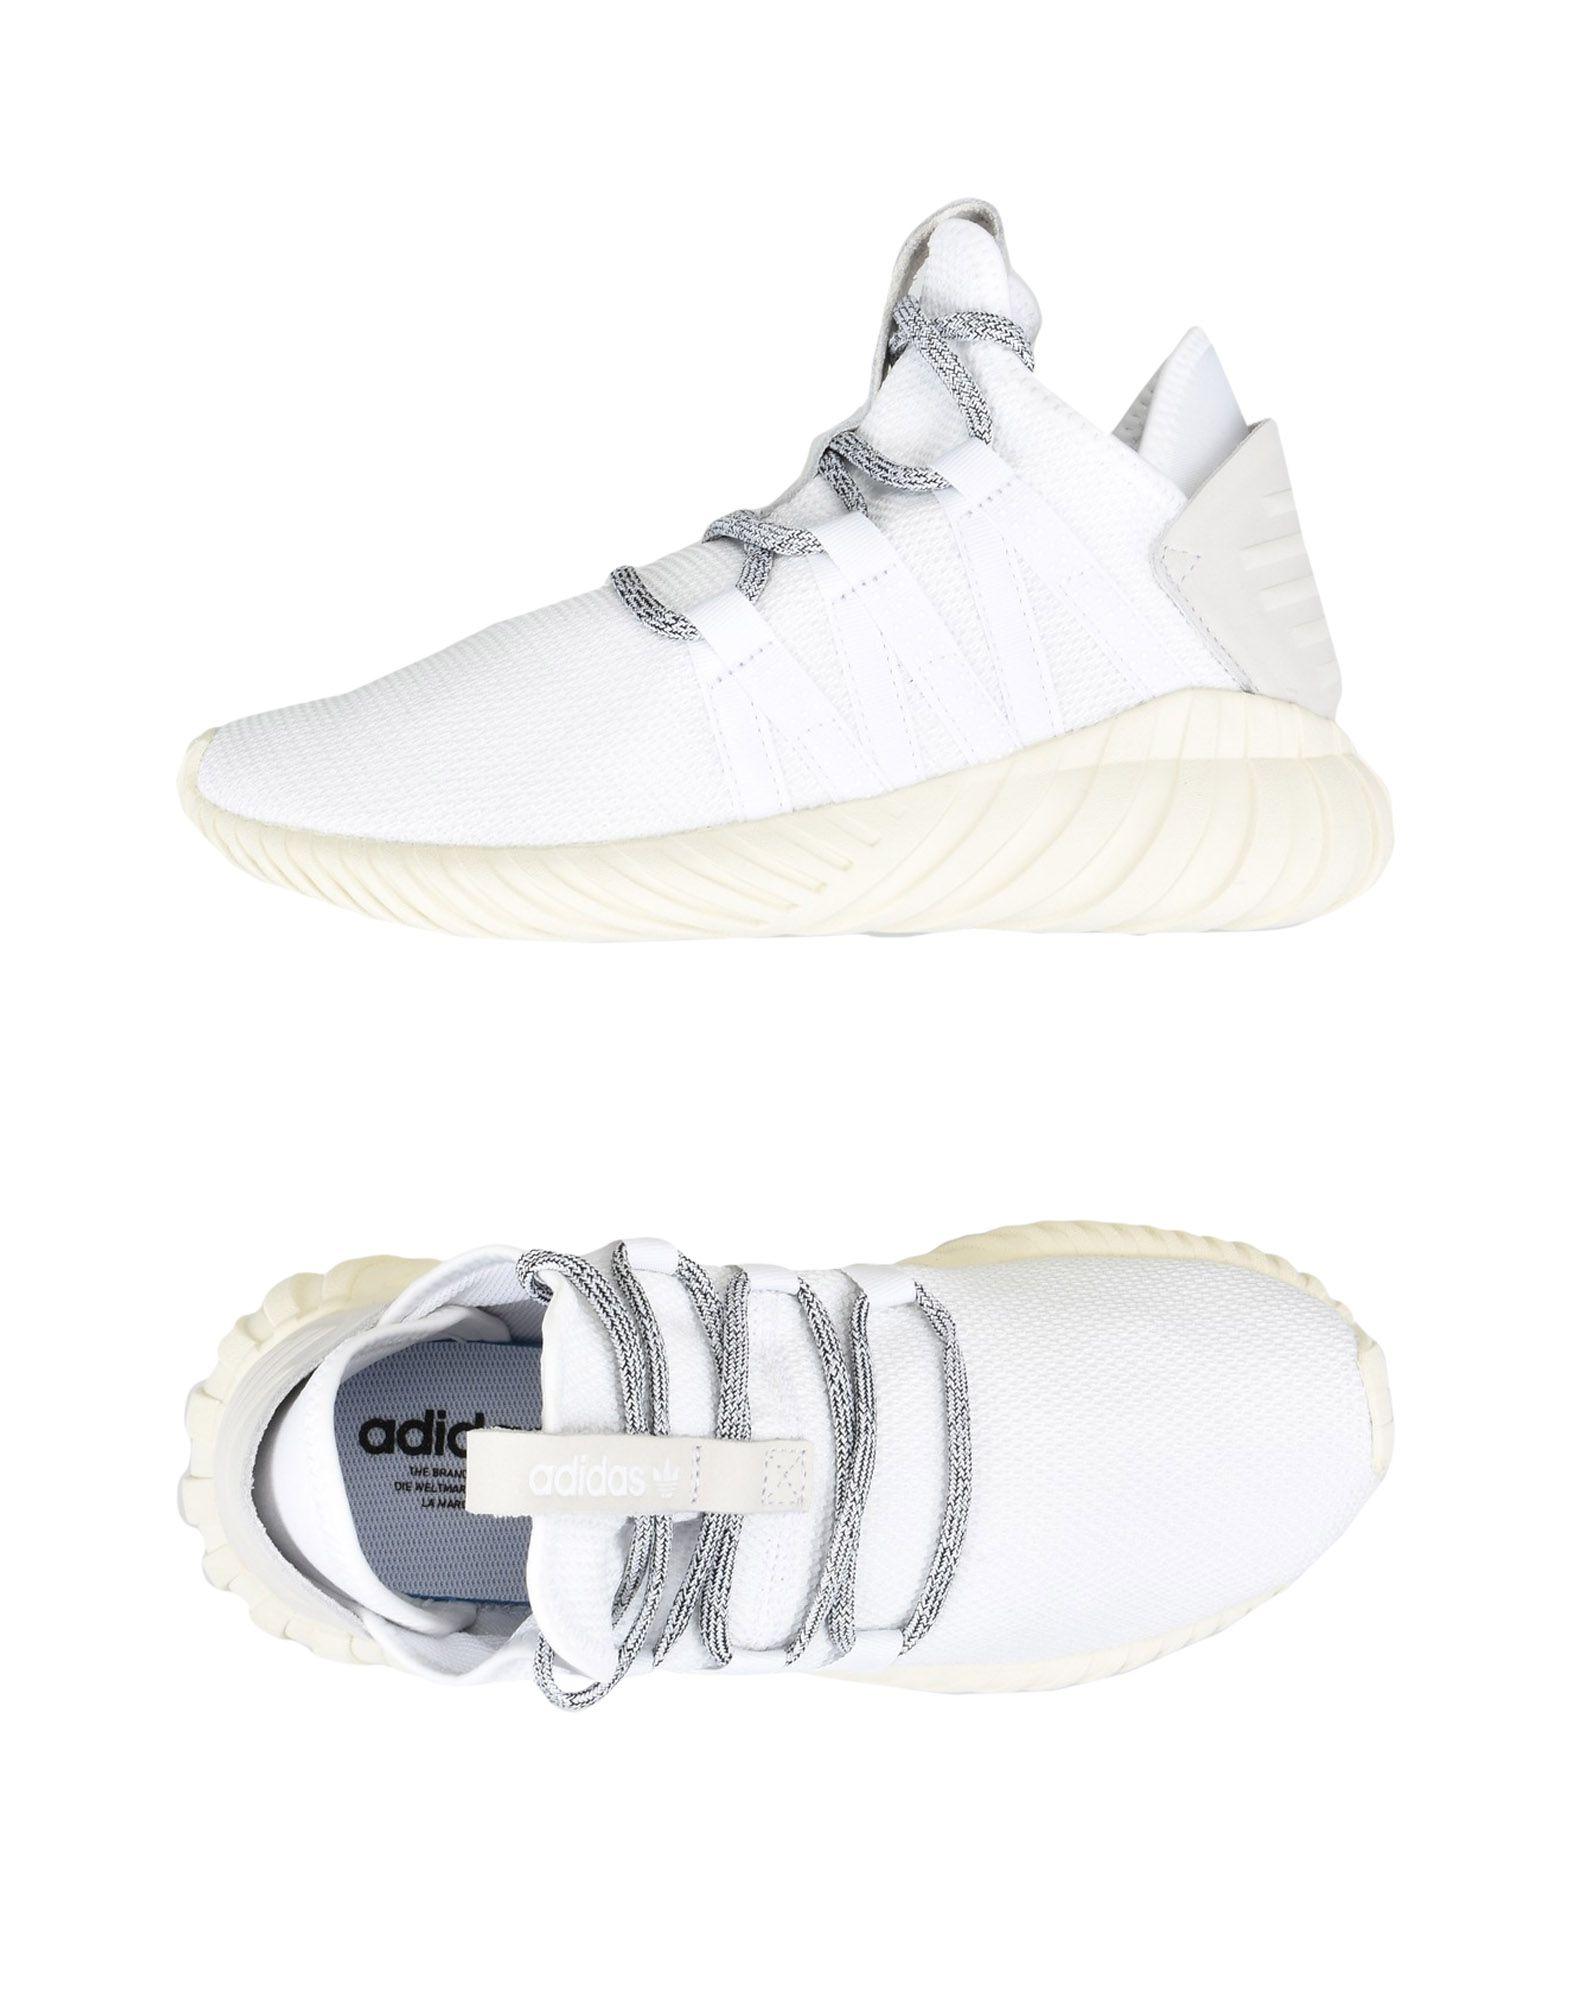 Turnschuhe Adidas Originals Tubular Dawn W - damen - 11344348HE